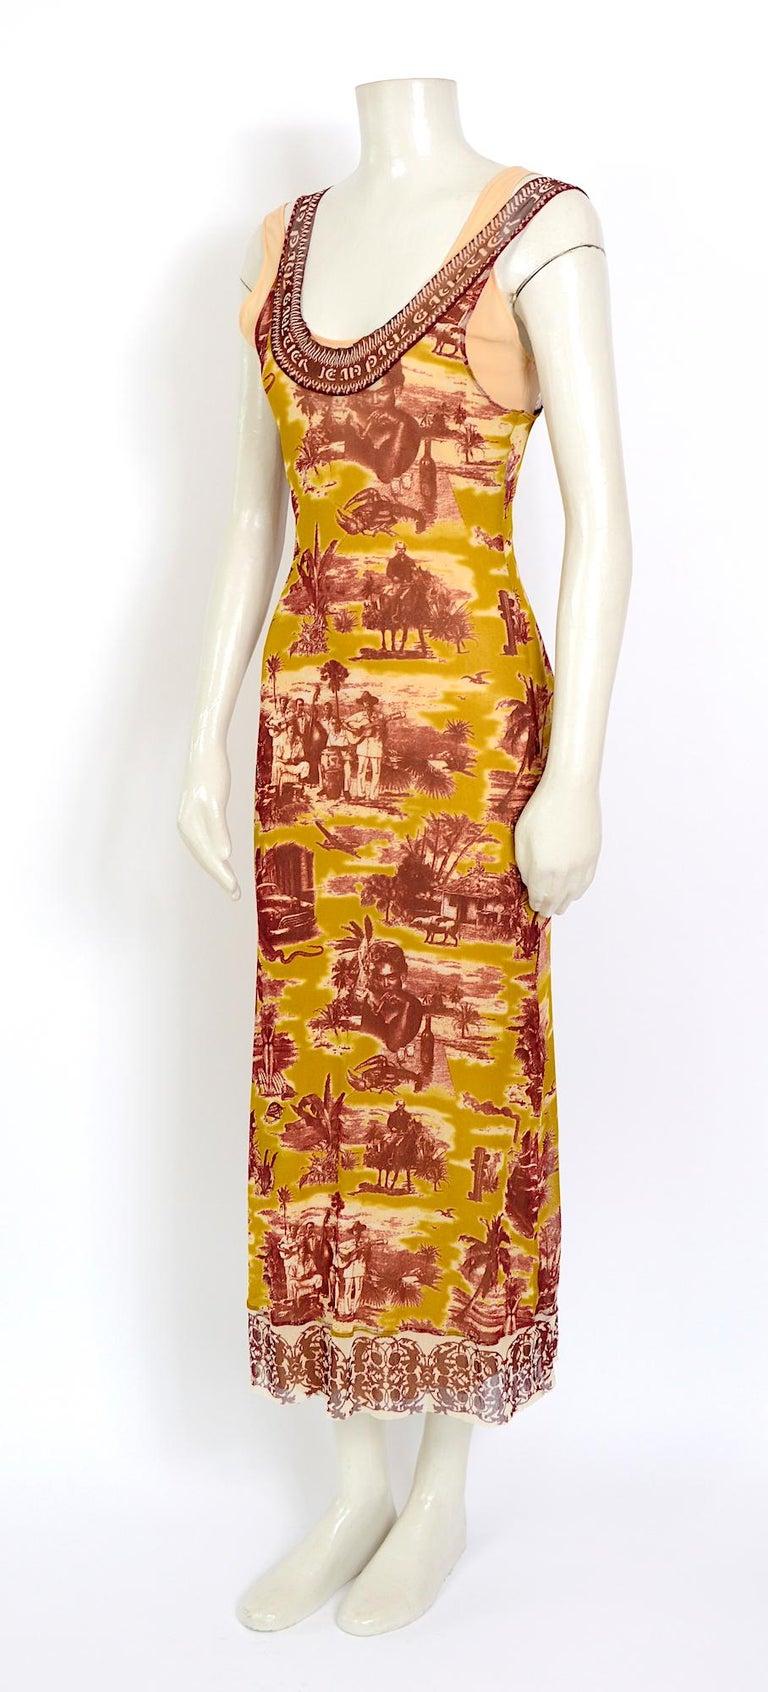 Jean Paul Gaultier classique vintage 1990s cuba print + nude mesh slip dresses  In Excellent Condition For Sale In Antwerp, BE